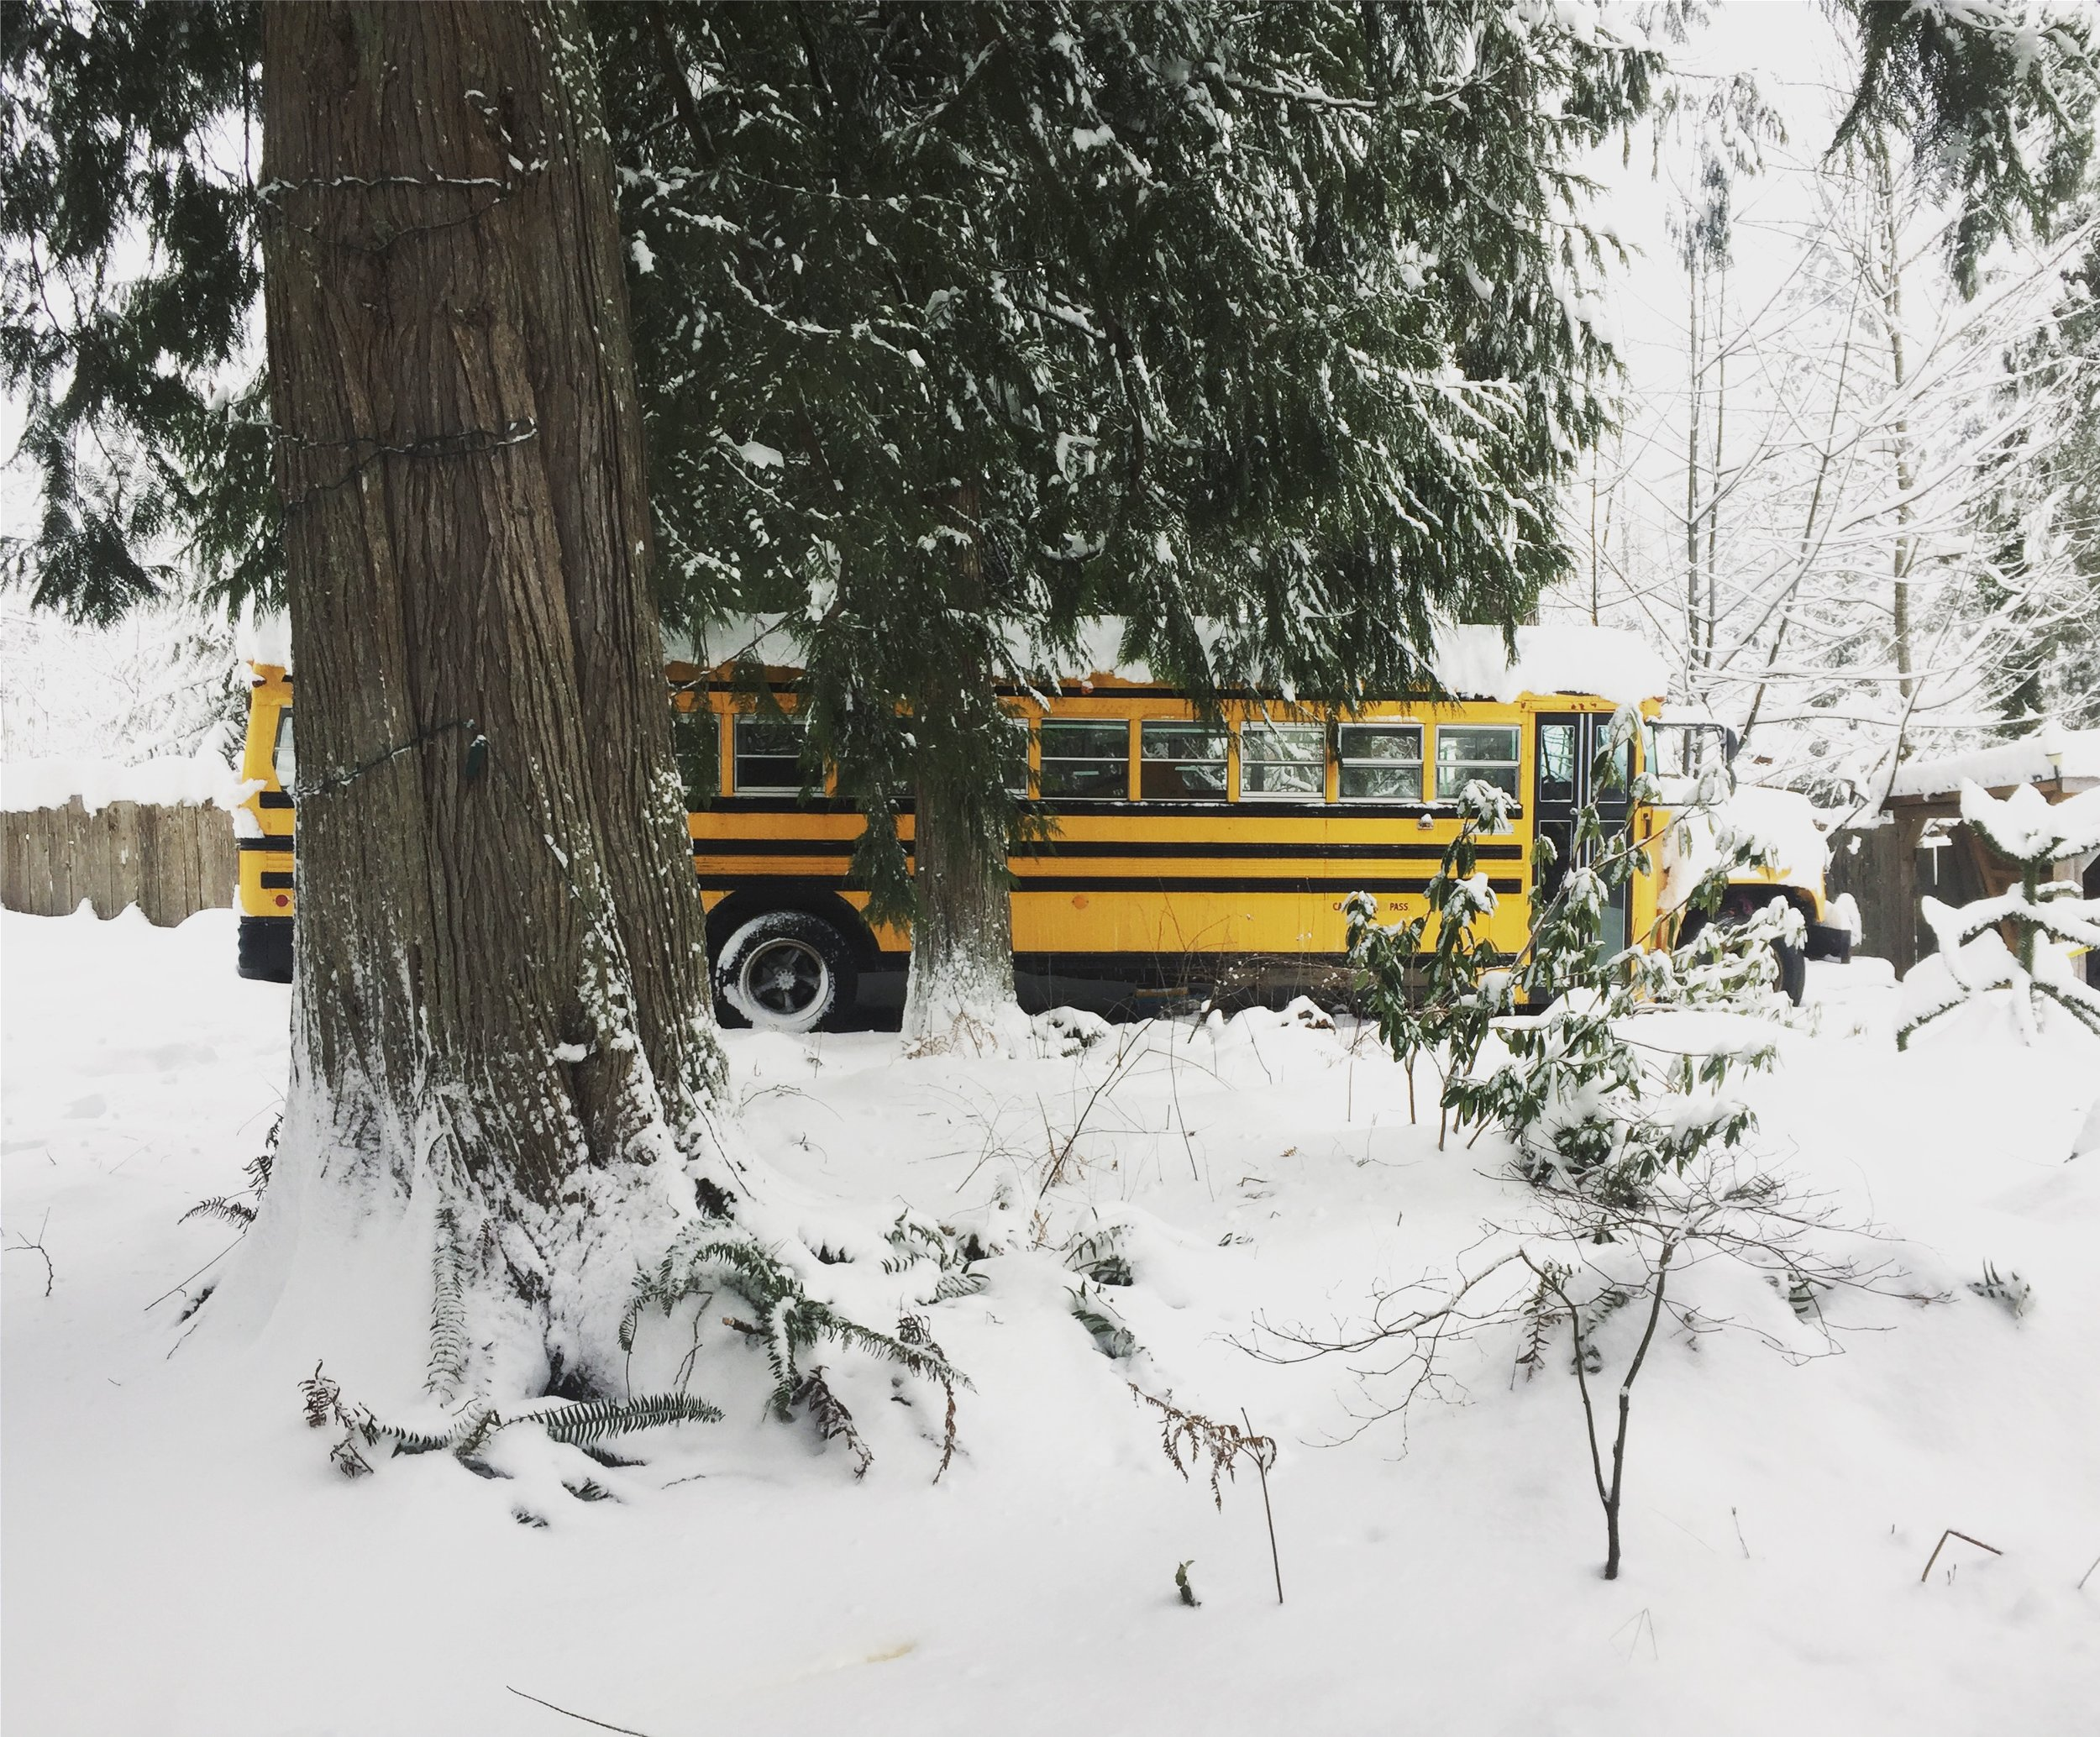 Tia Winter Photo - Bus - Tiny Life Supply (2).JPG